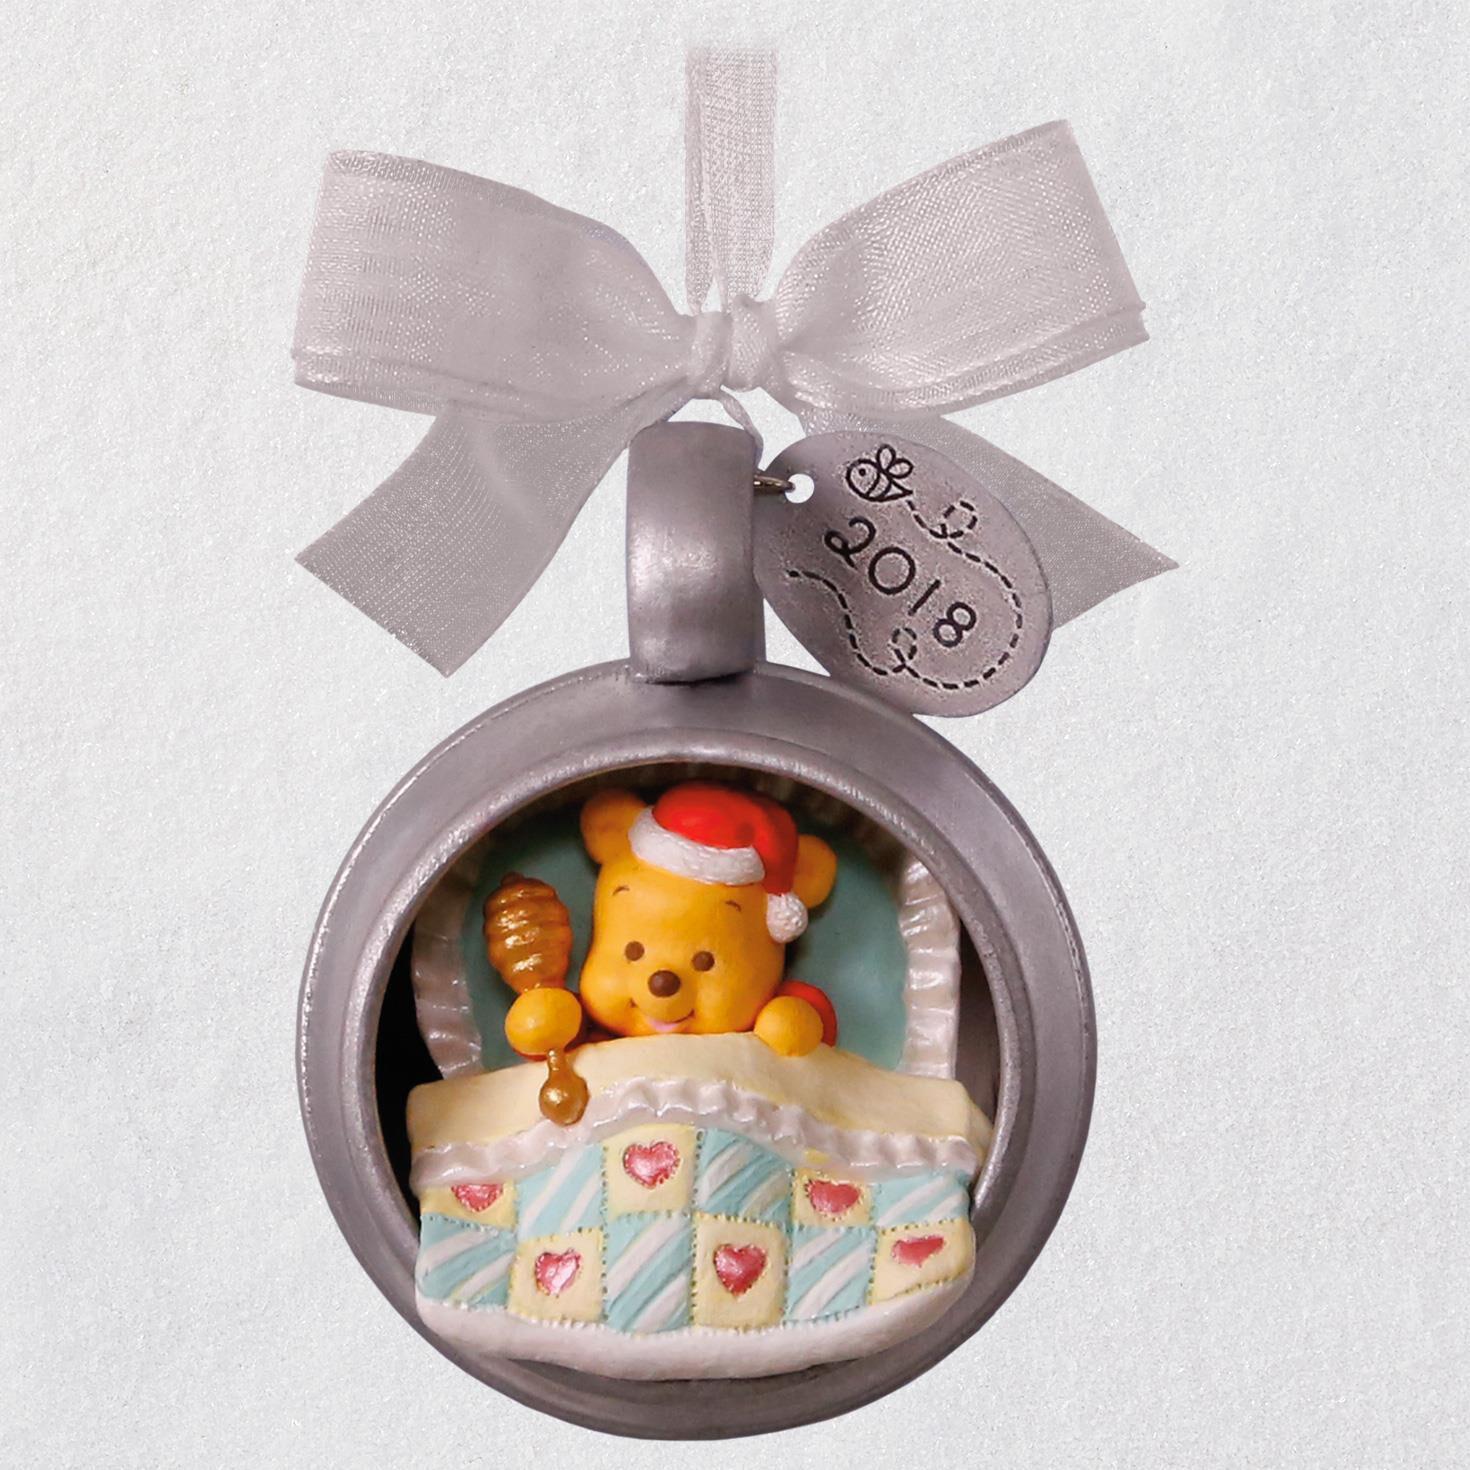 Disney Winnie The Pooh Baby's First Christmas 2018 Metal